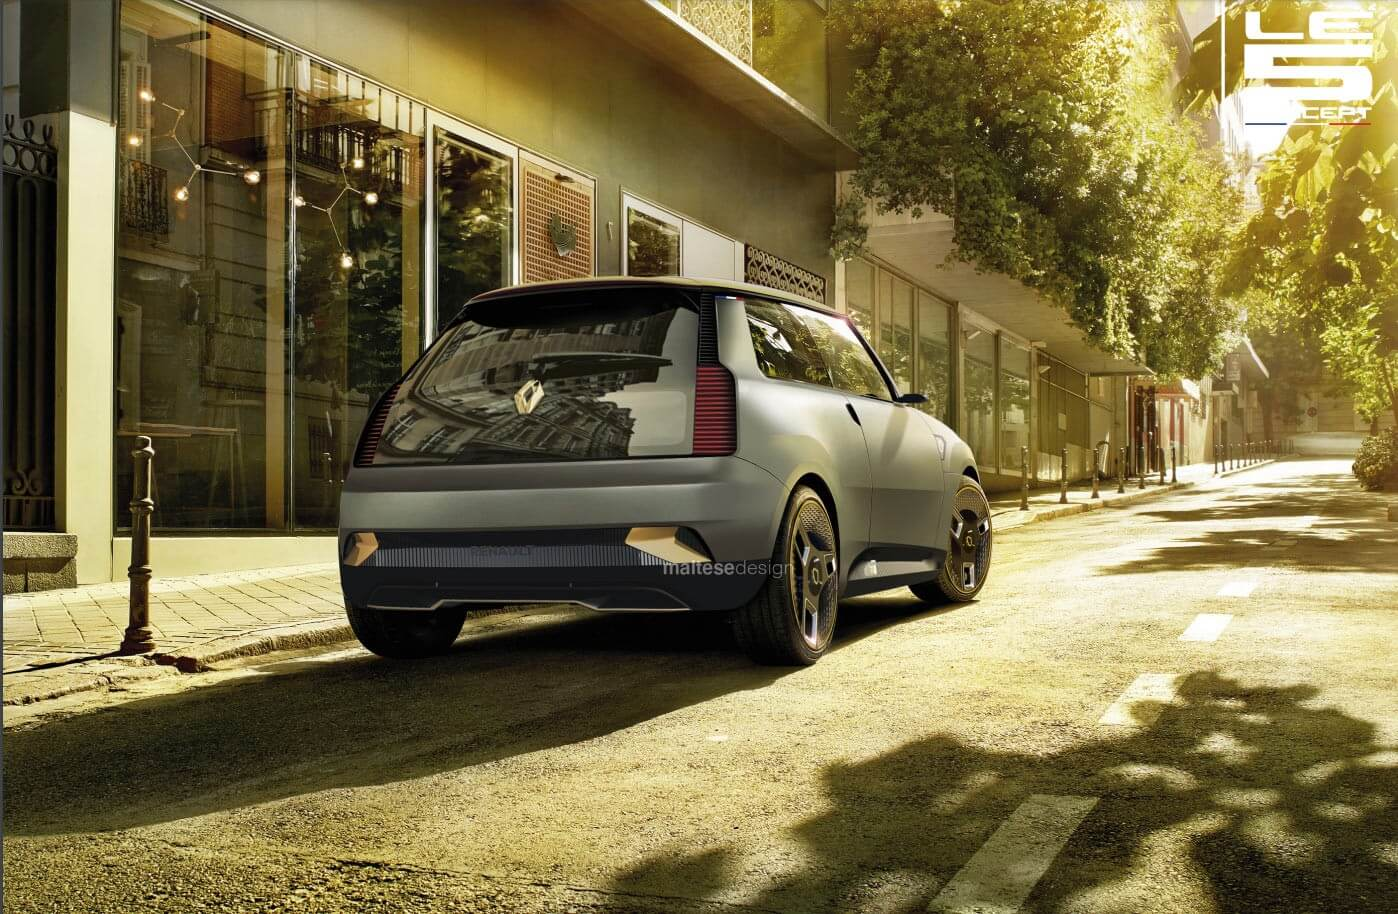 O Le 5 Concept Imagina O Regresso Do Historico Renault 5